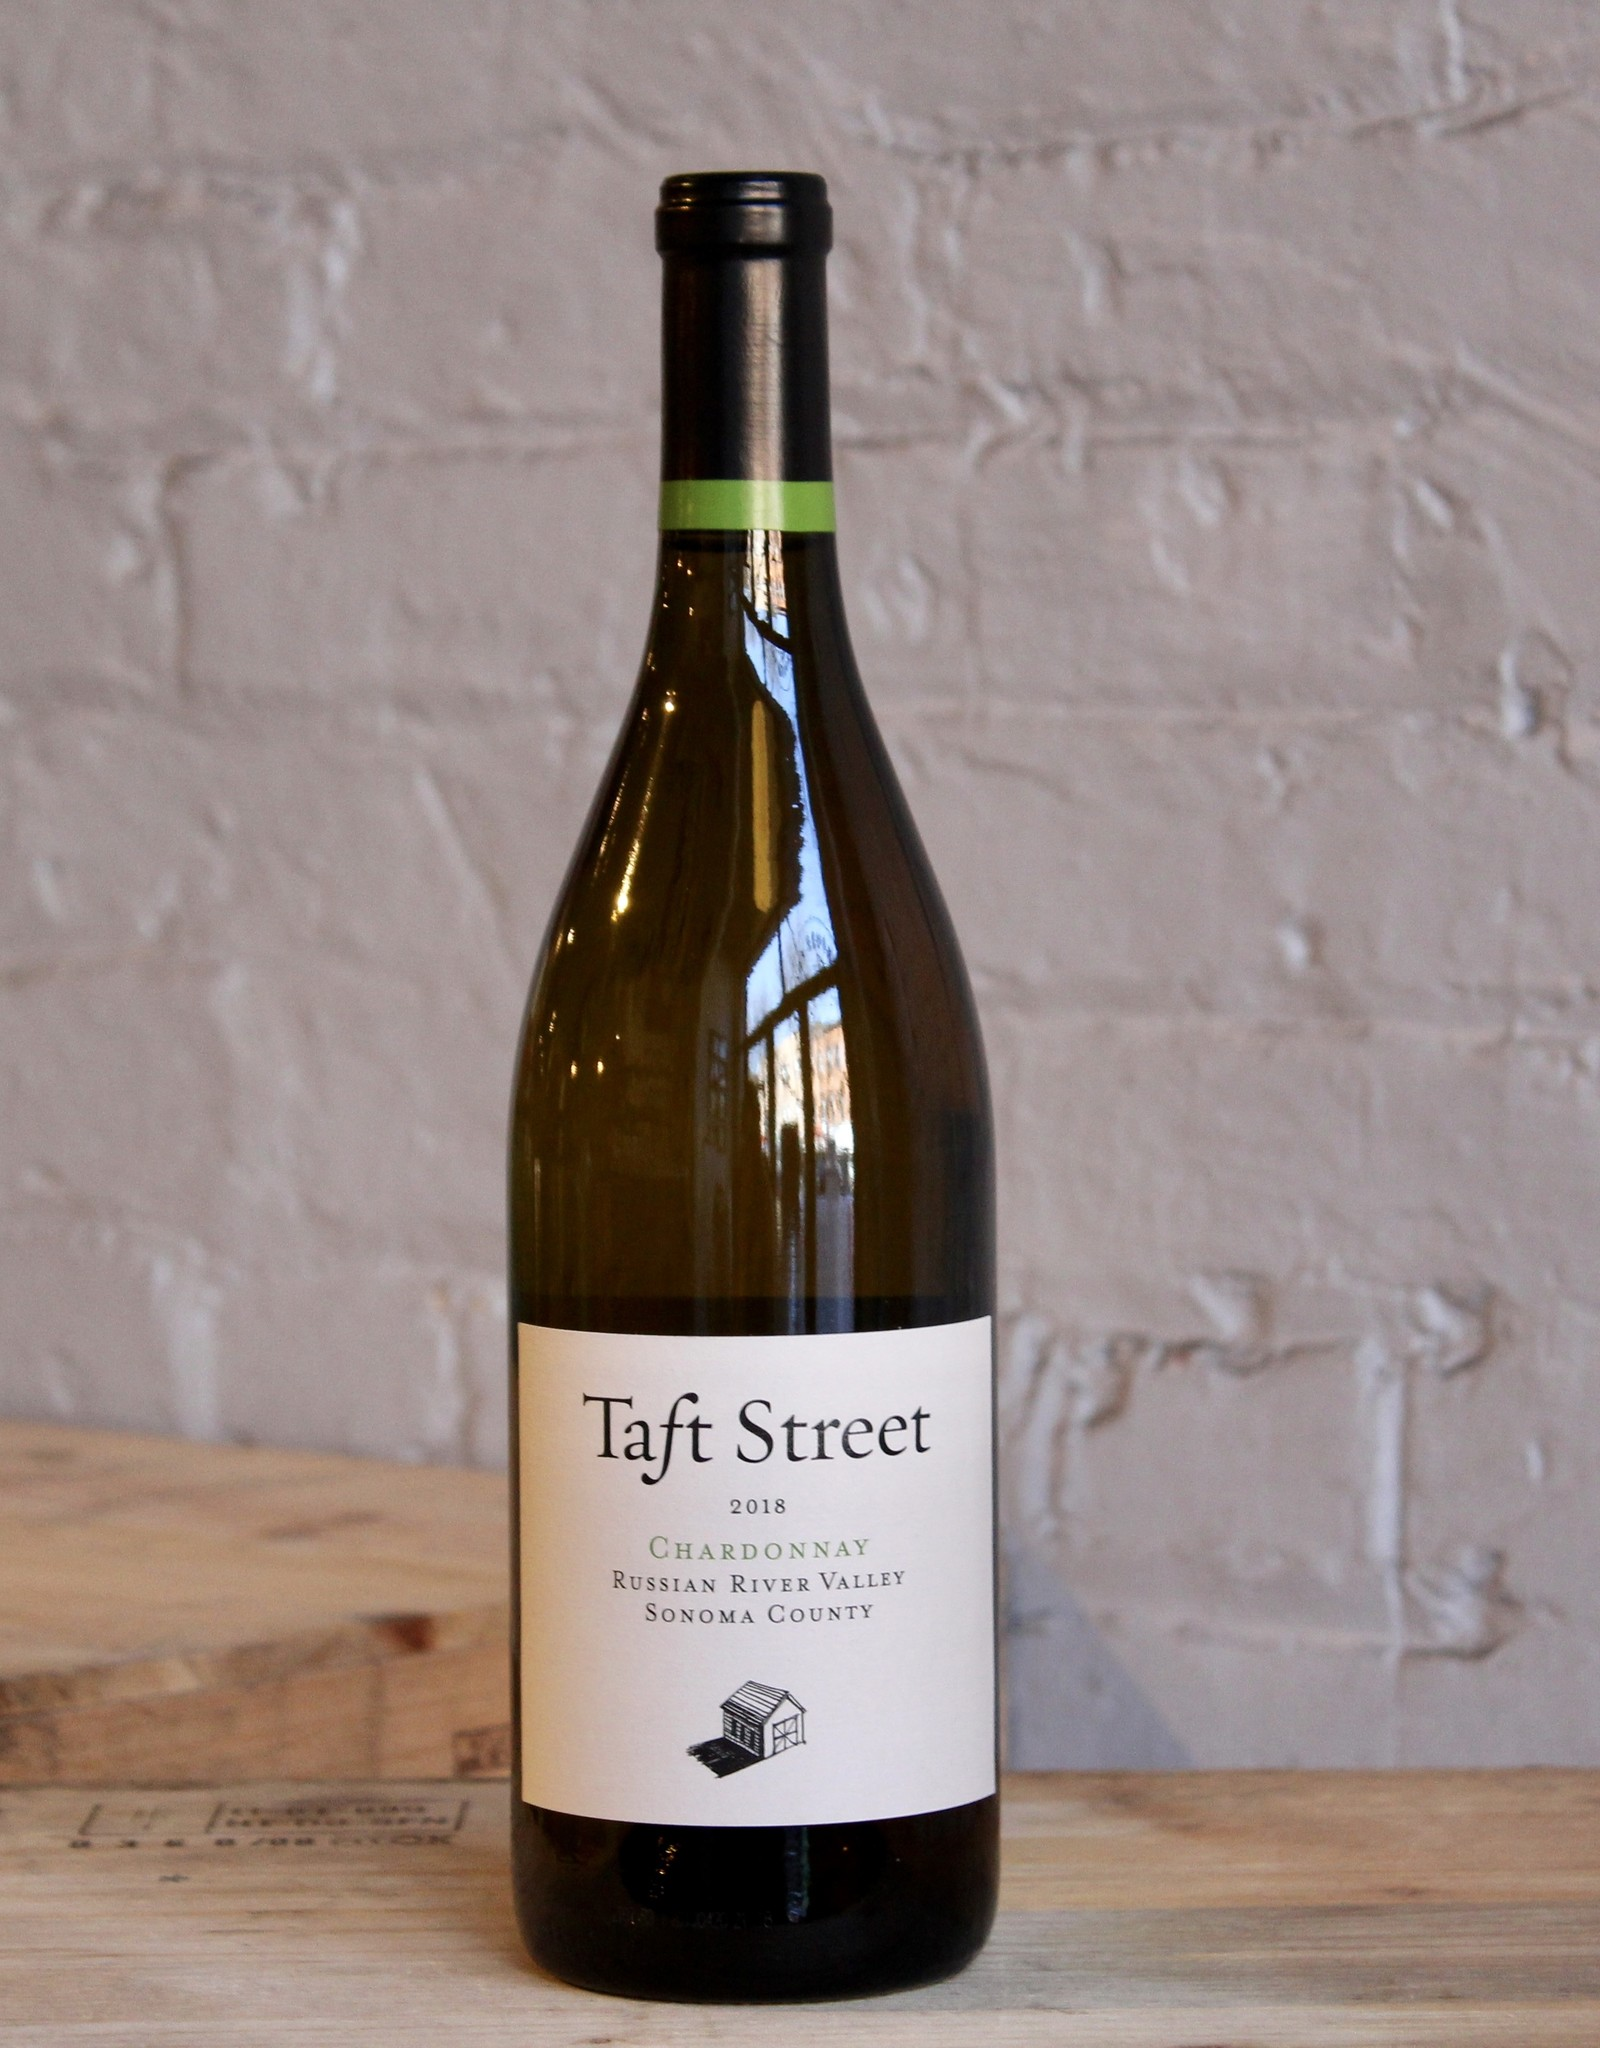 Wine 2018 Taft Street Chardonnay - Russian River Valley, Sonoma, CA (750ml)